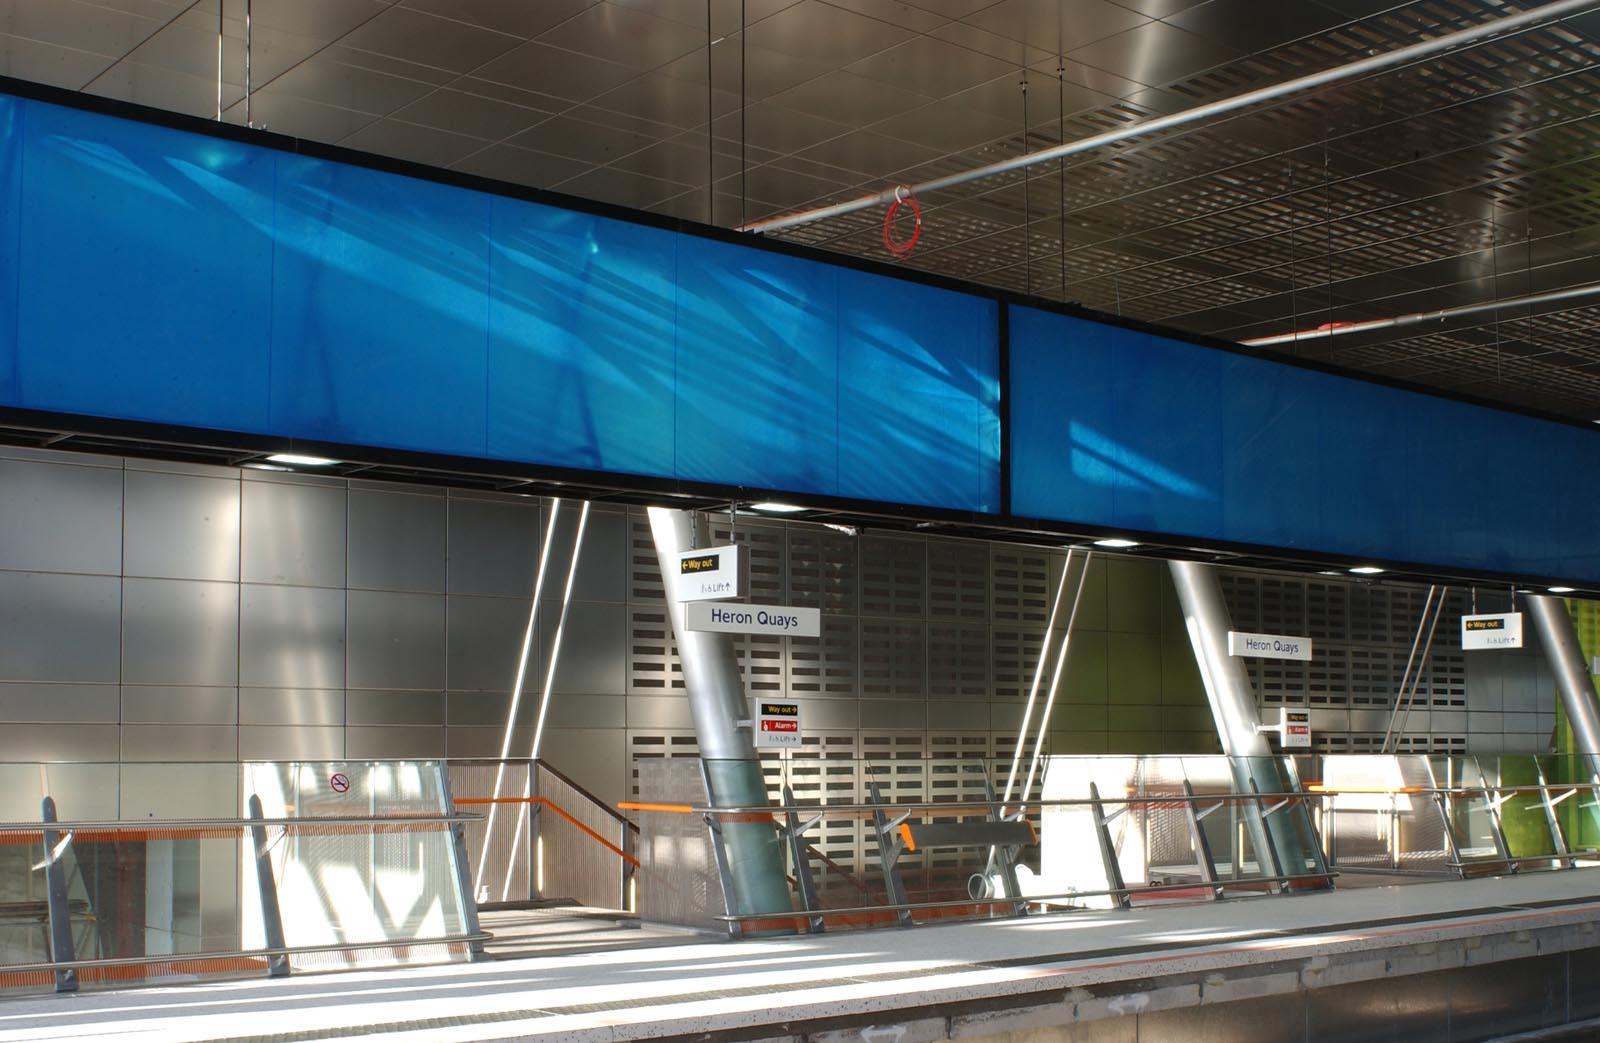 Heron Quays Station Architecture - London UK